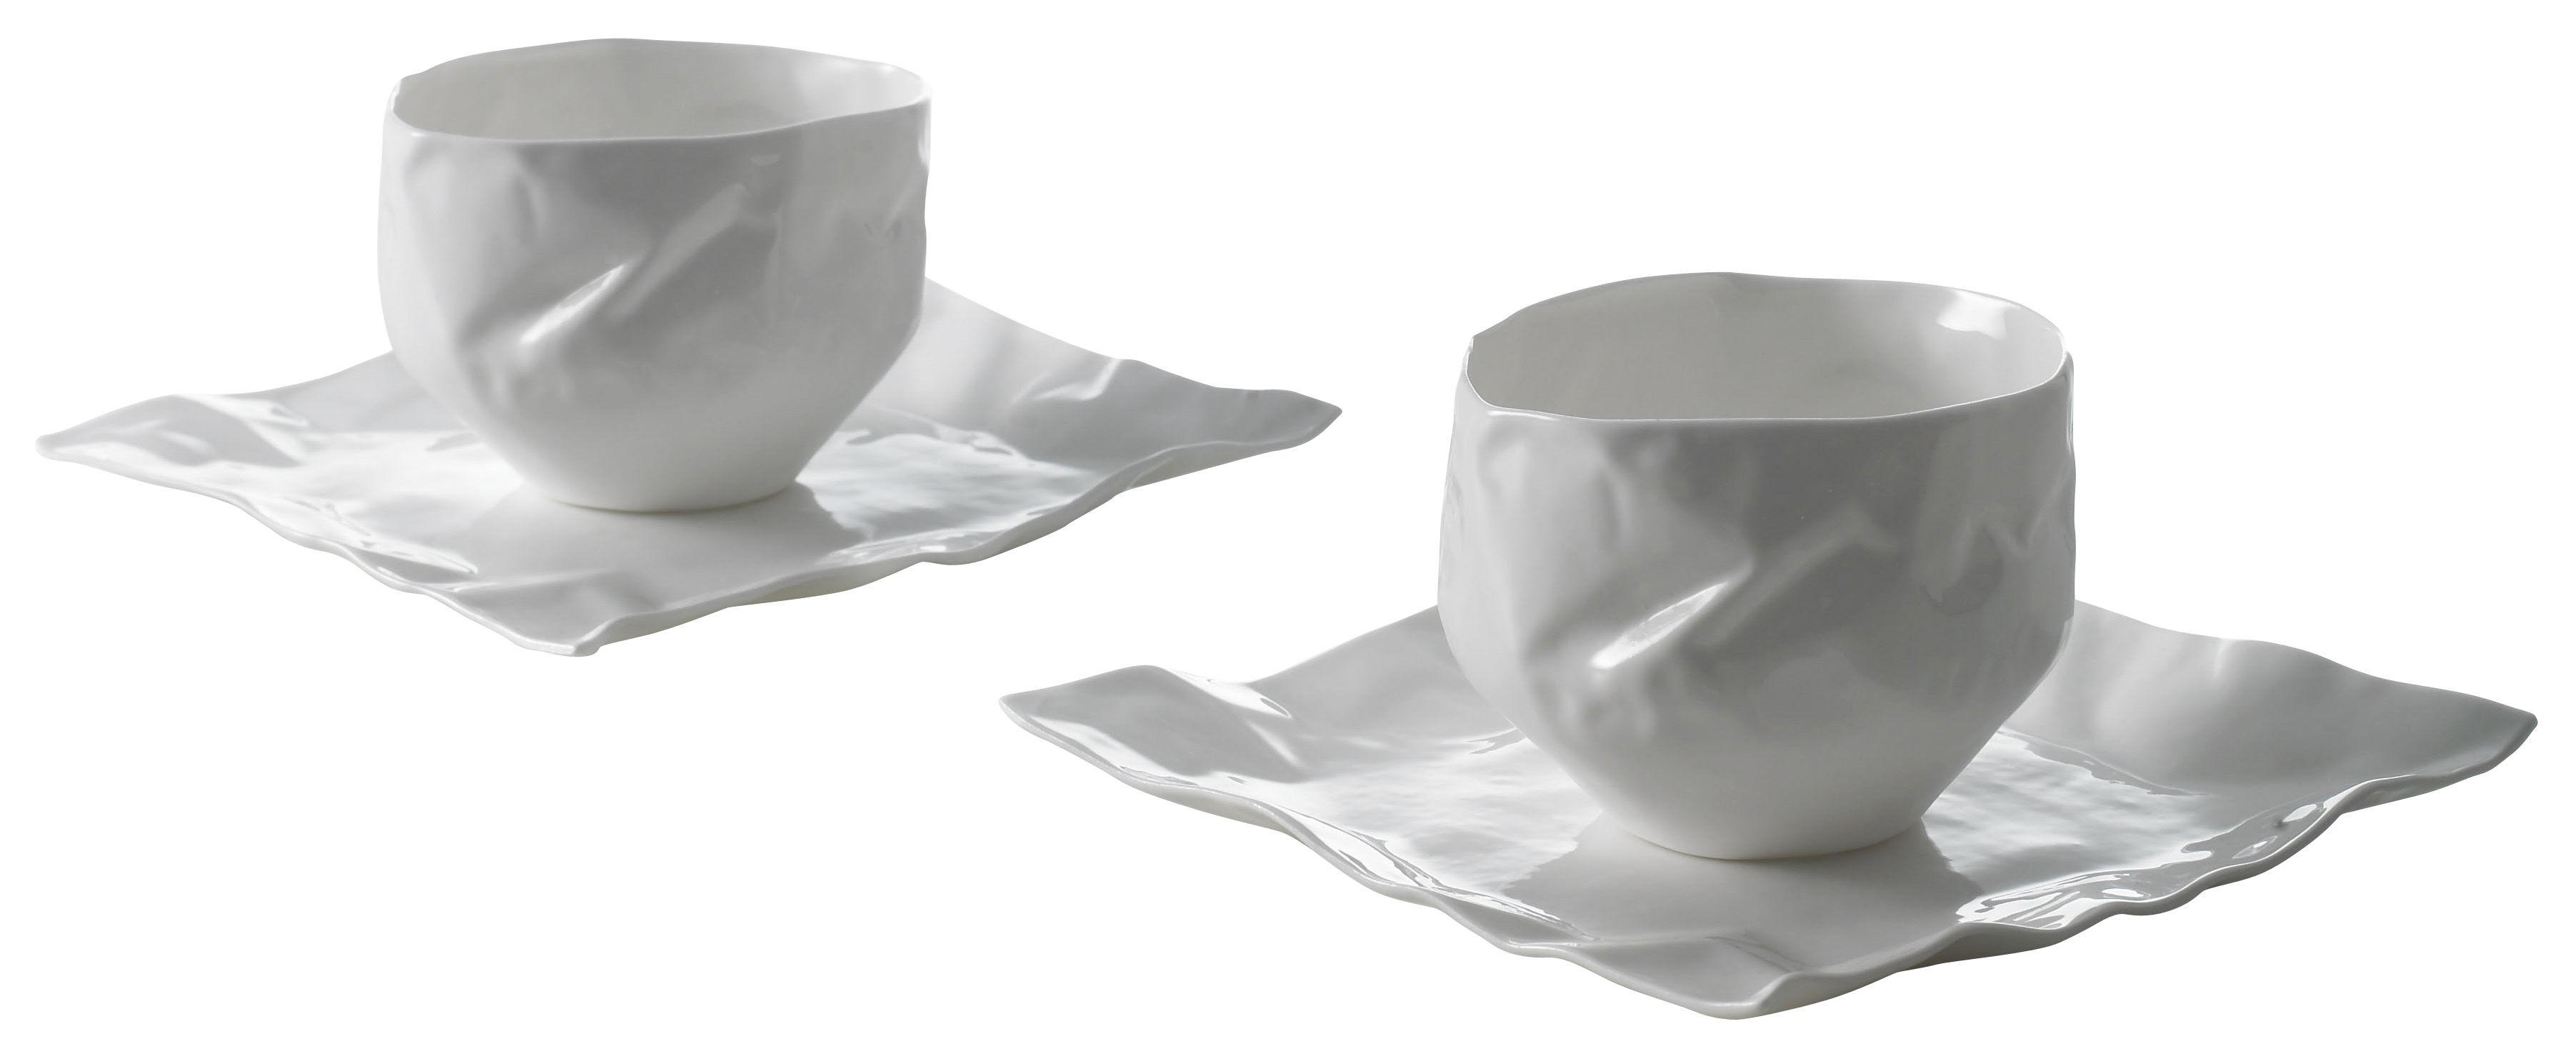 Arts de la table - Tasses et mugs - Set vaisselle Adelaïde XIV 2 tasses + 2 soucoupes - Driade Kosmo - Blanc - Porcelaine Bone China